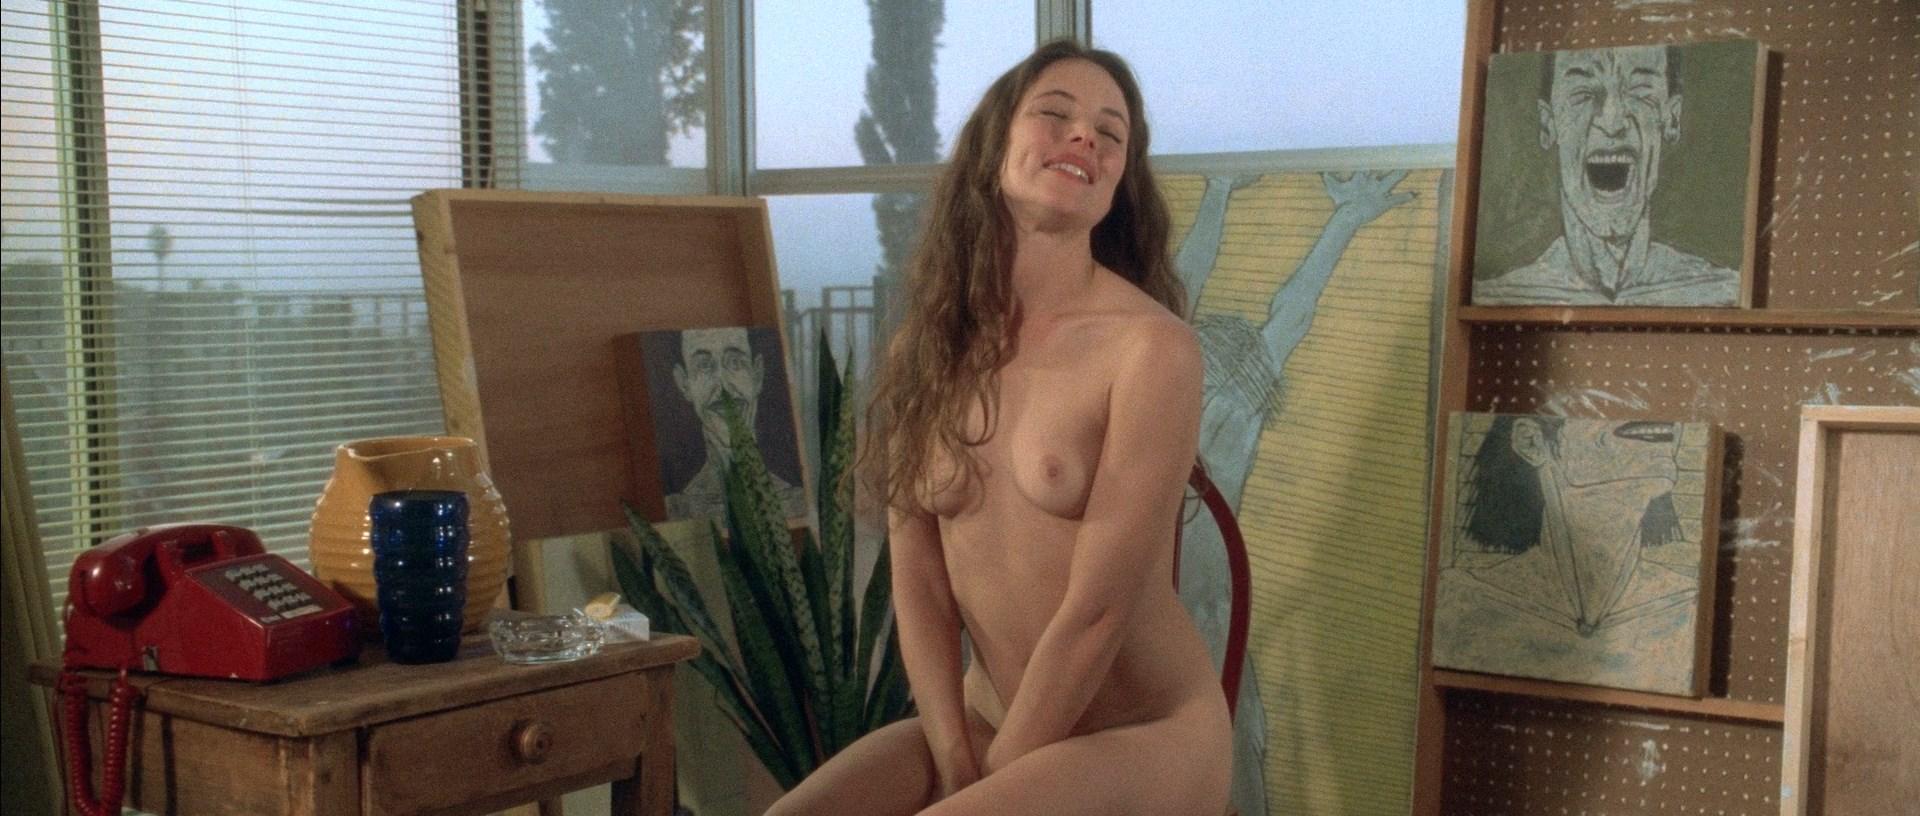 Madeleine stowe nude pics — img 15